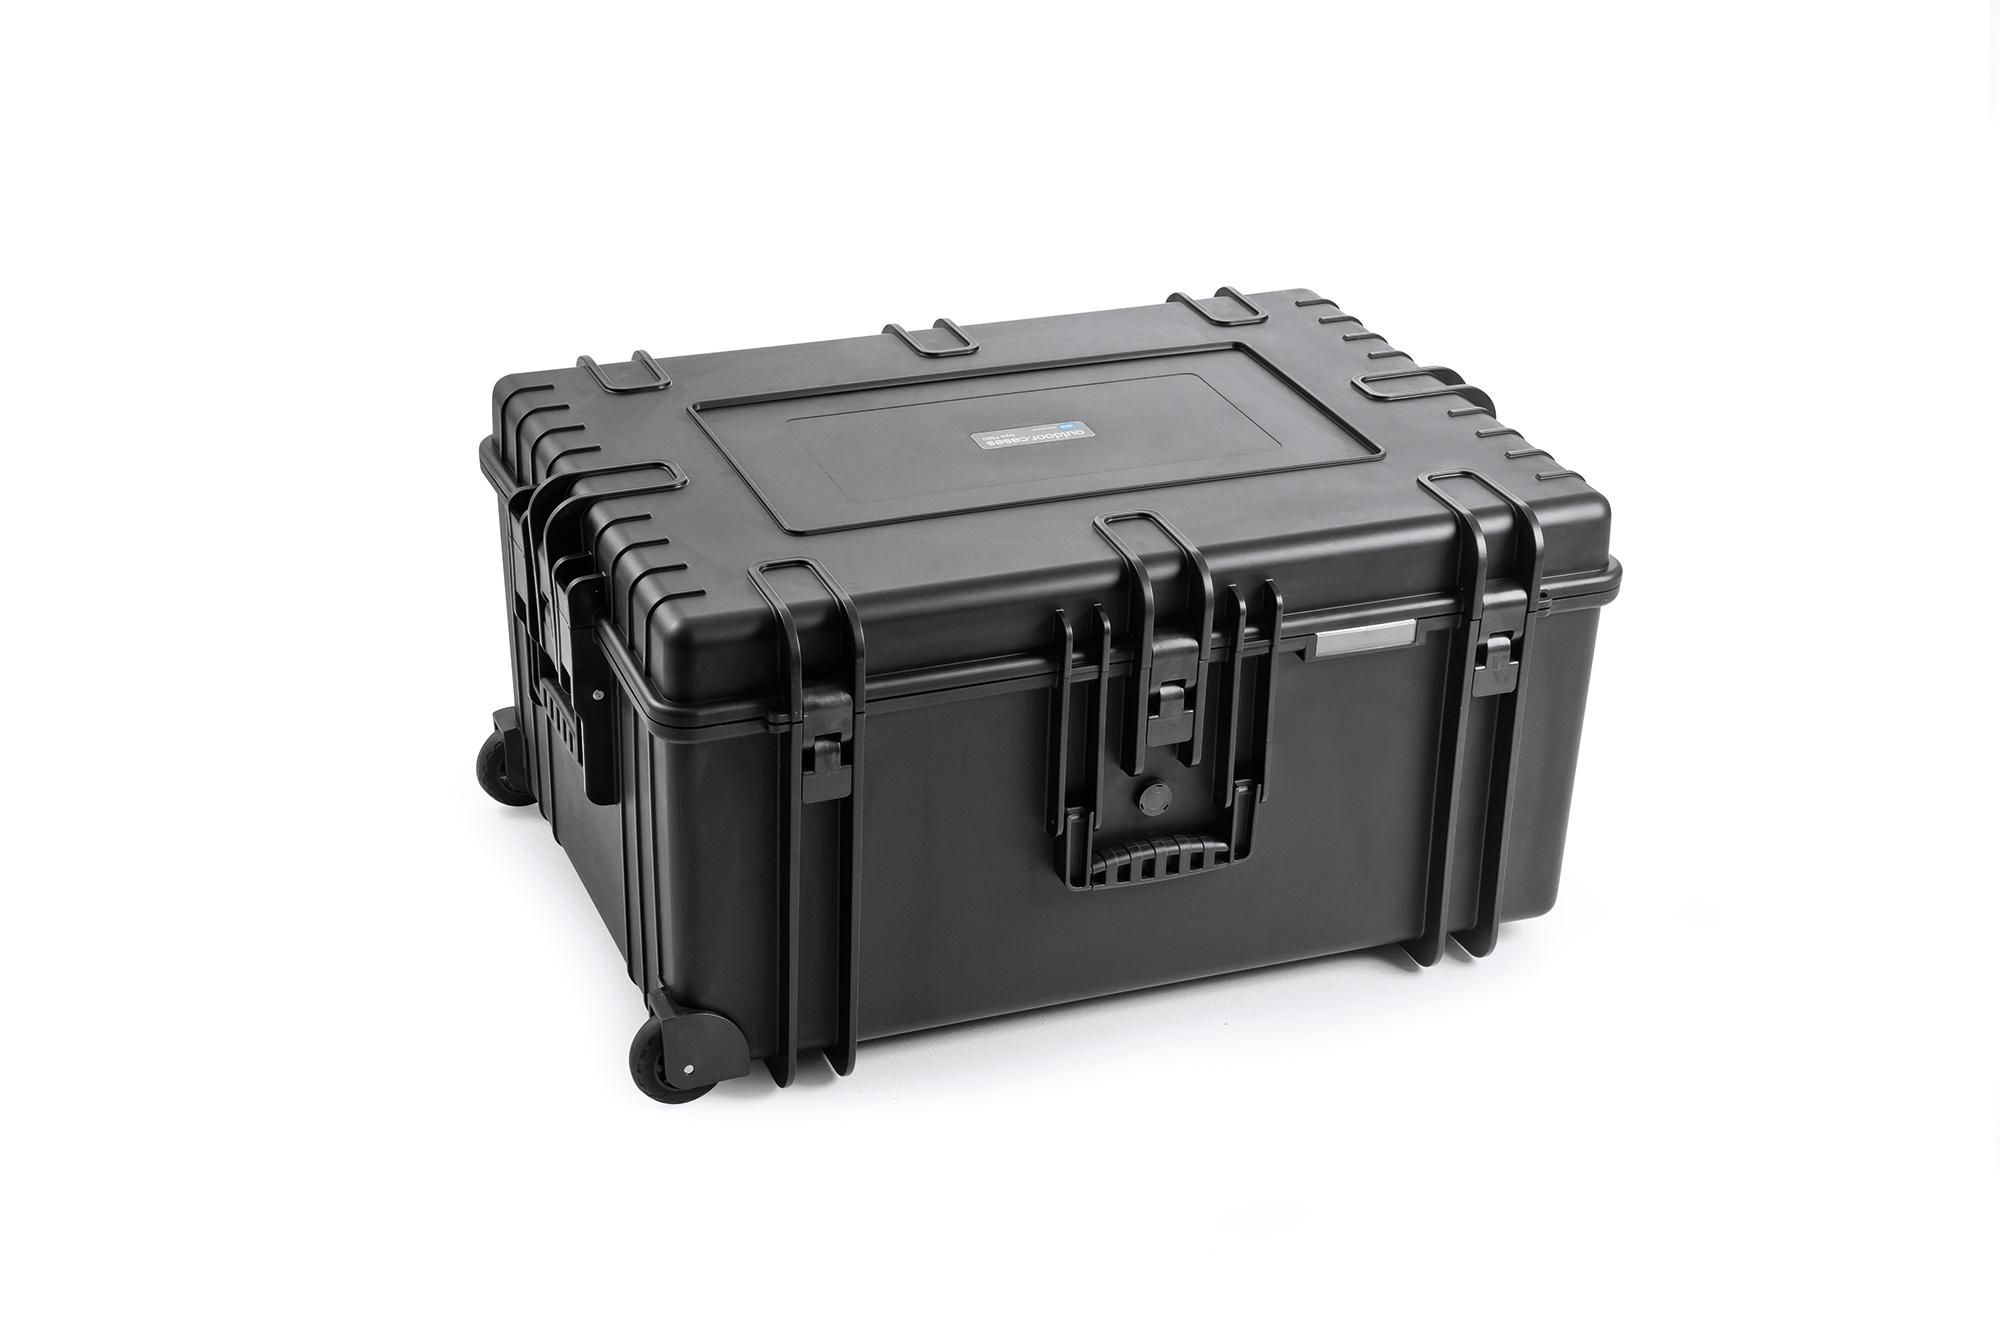 B&W outdoor.case type 7800